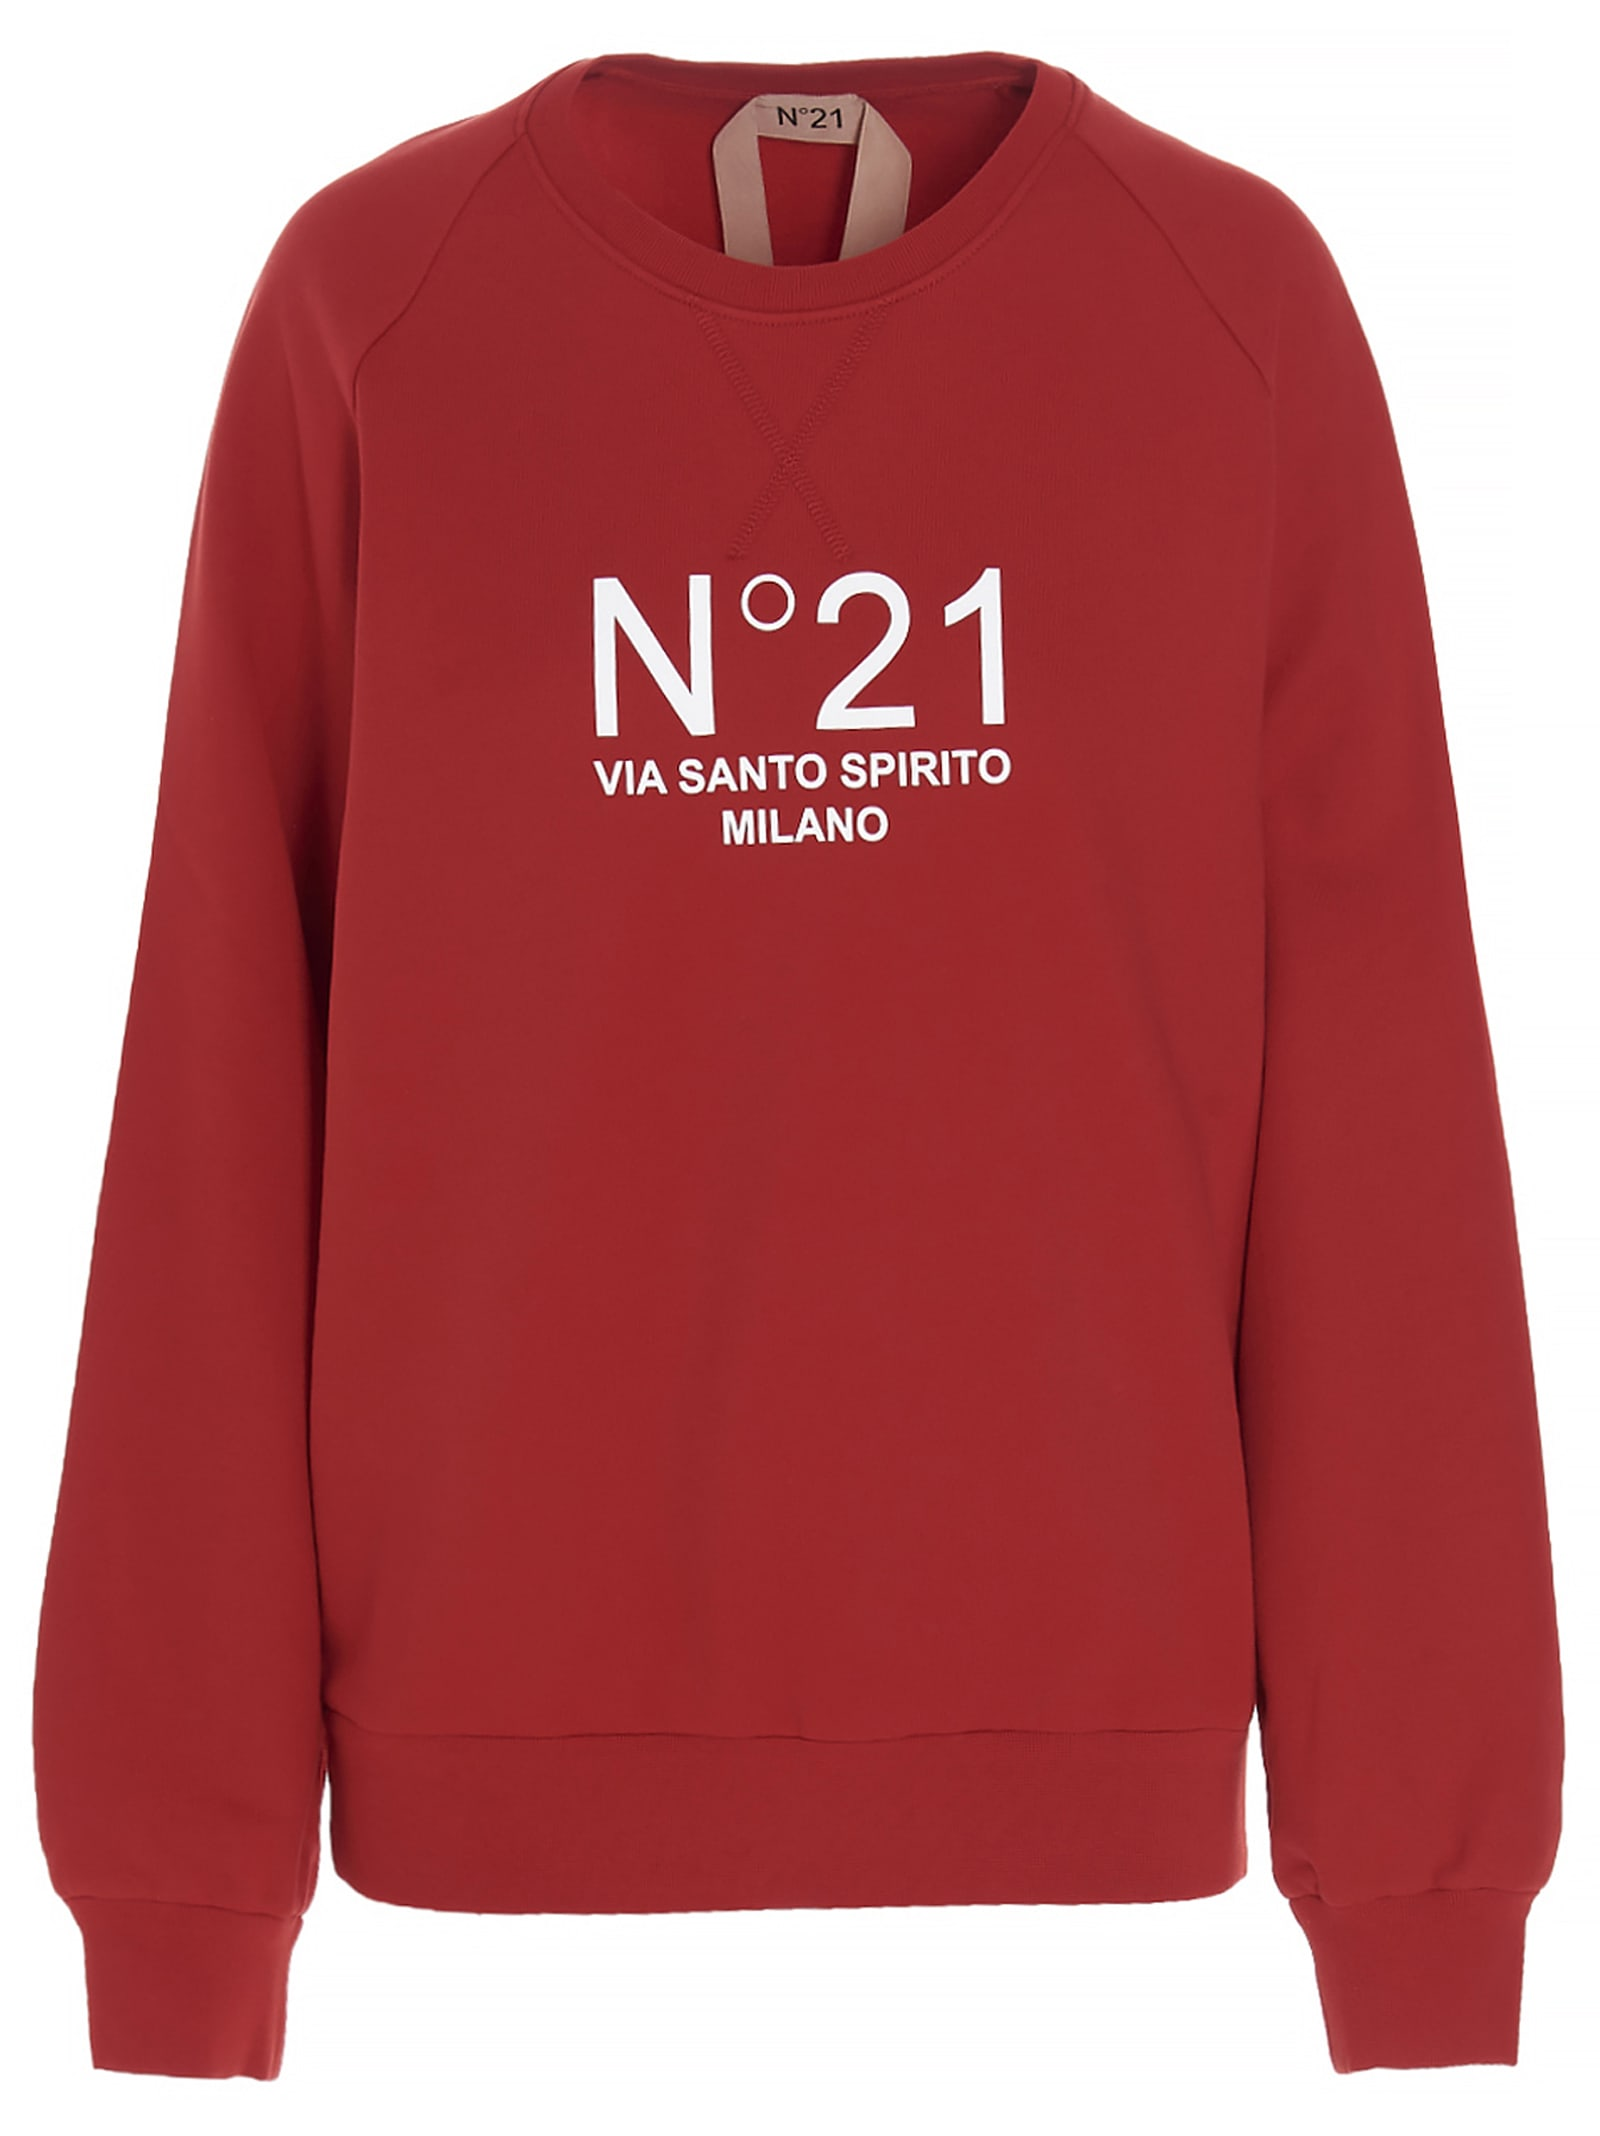 N°21 Cottons N21 SANTO SPIRITO SWEATSHIRT